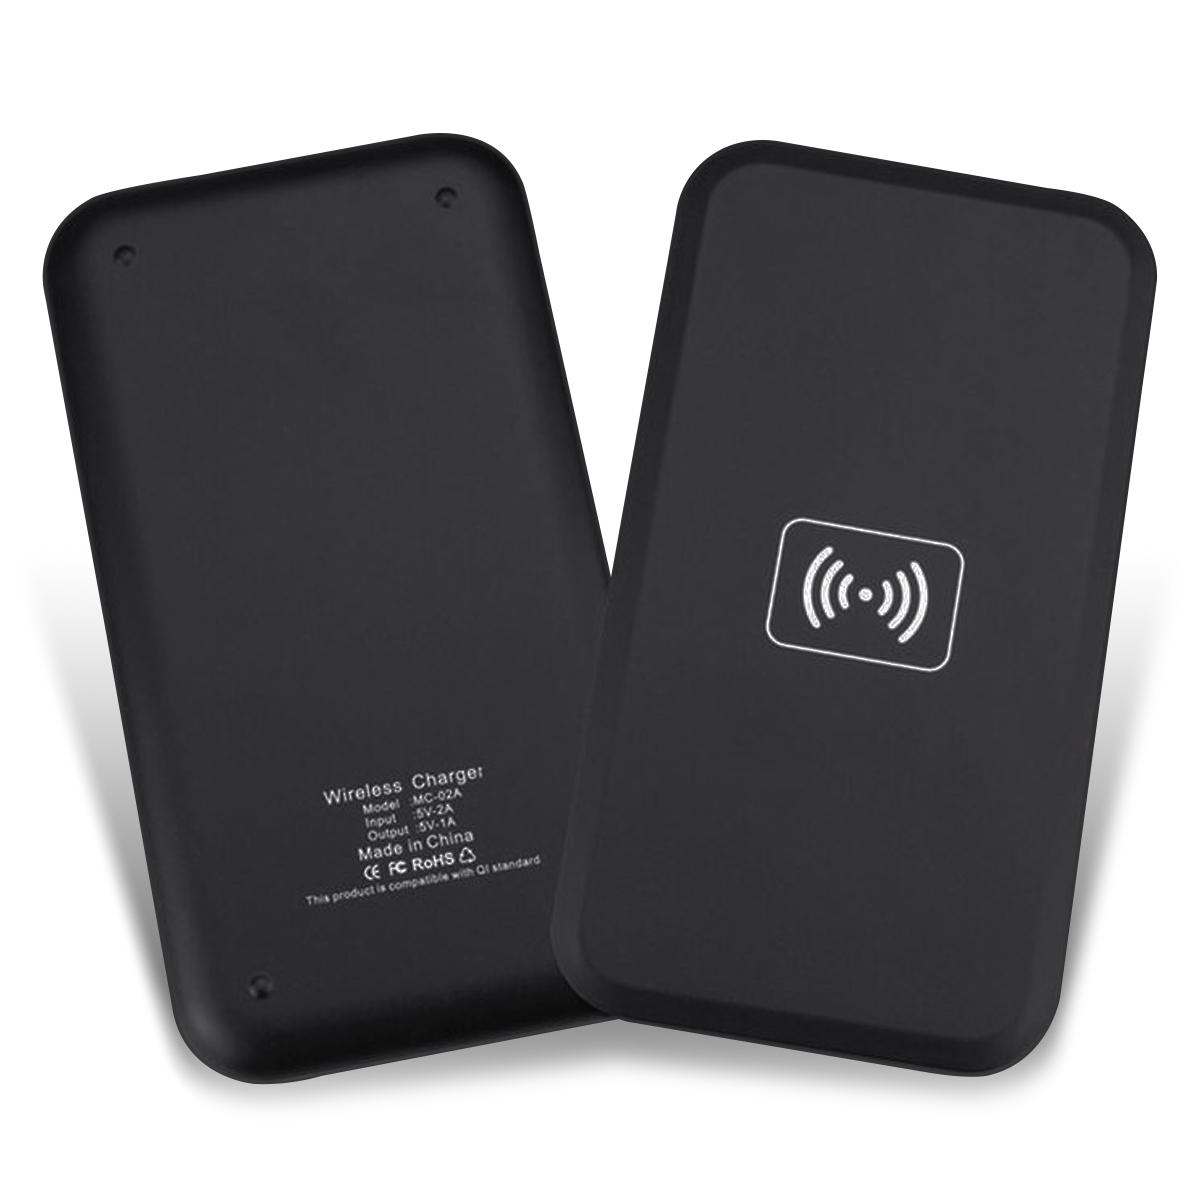 schnell ladeger t apple iphone 11 pro max qi wireless charger induktives laden elektronik netz. Black Bedroom Furniture Sets. Home Design Ideas